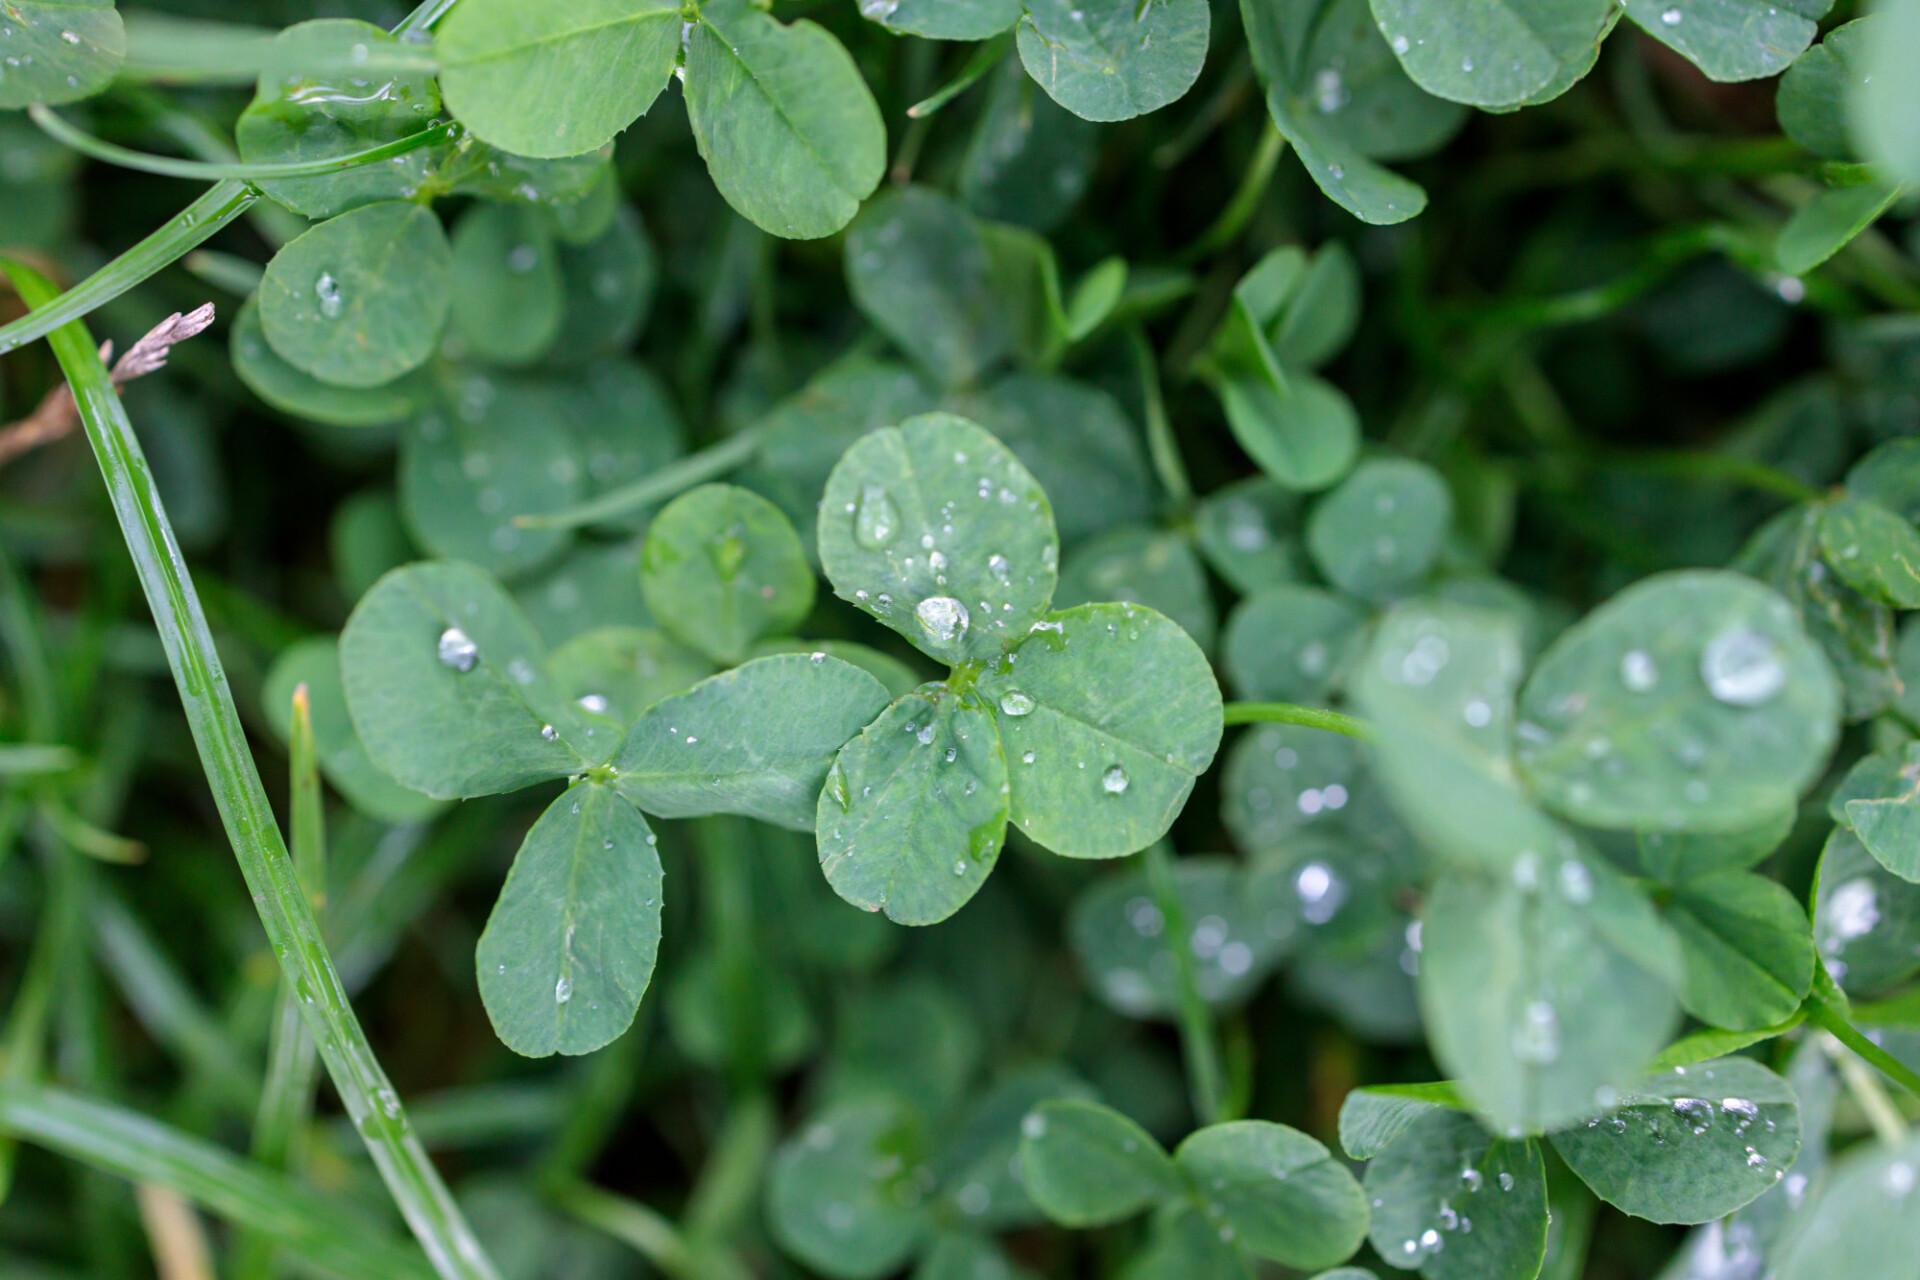 Clover in the rain